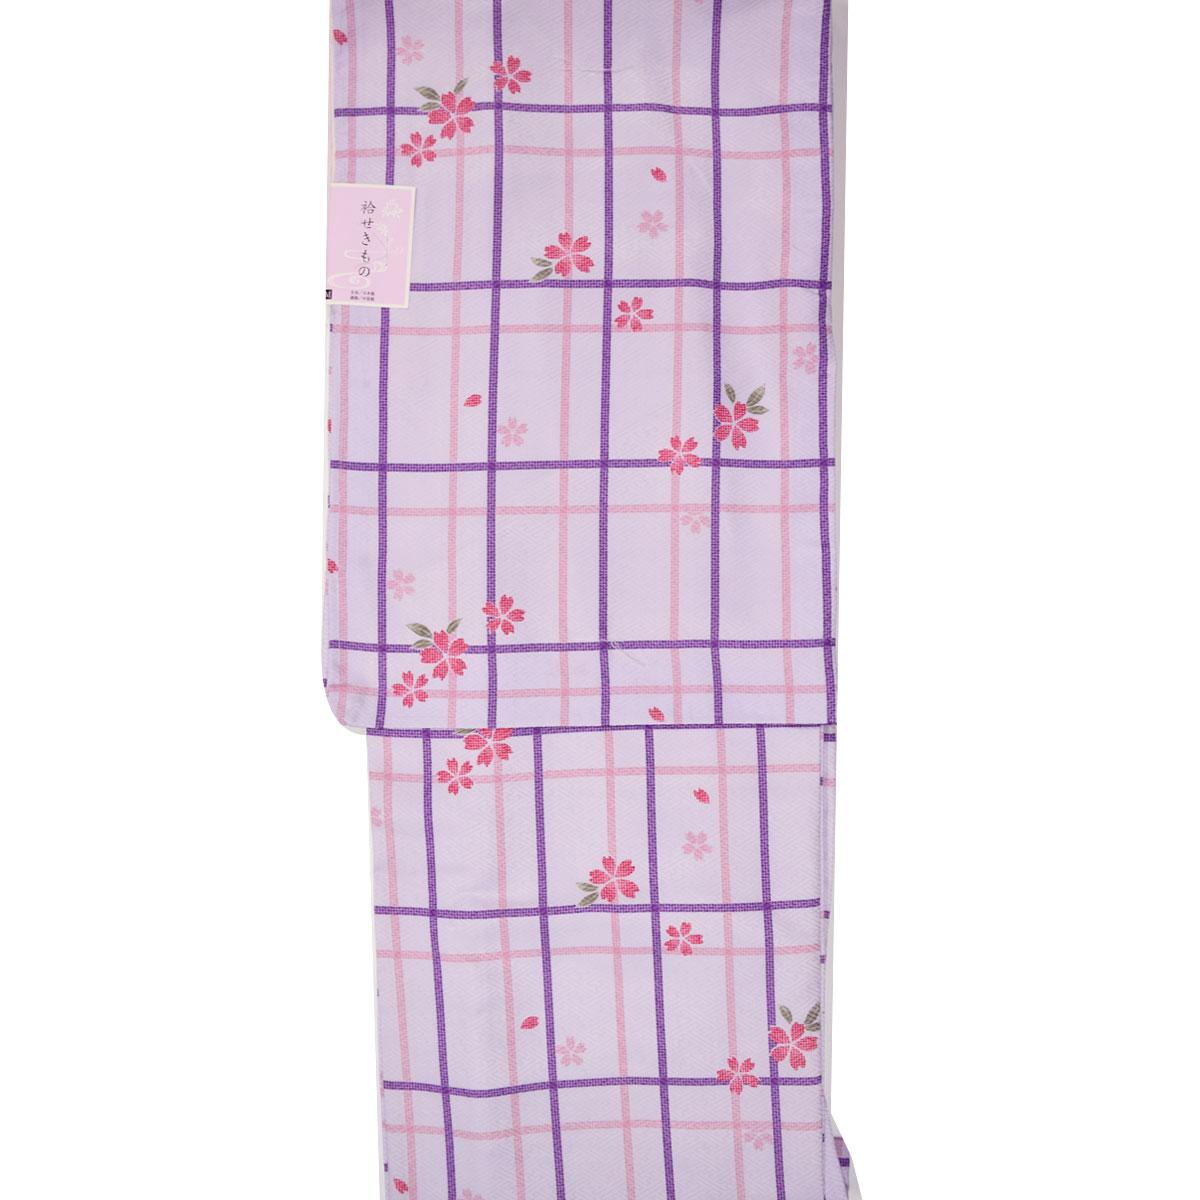 【M寸】上質生地仕立て上がり袷洗える着物【単品】番号c905-32 kimono washable